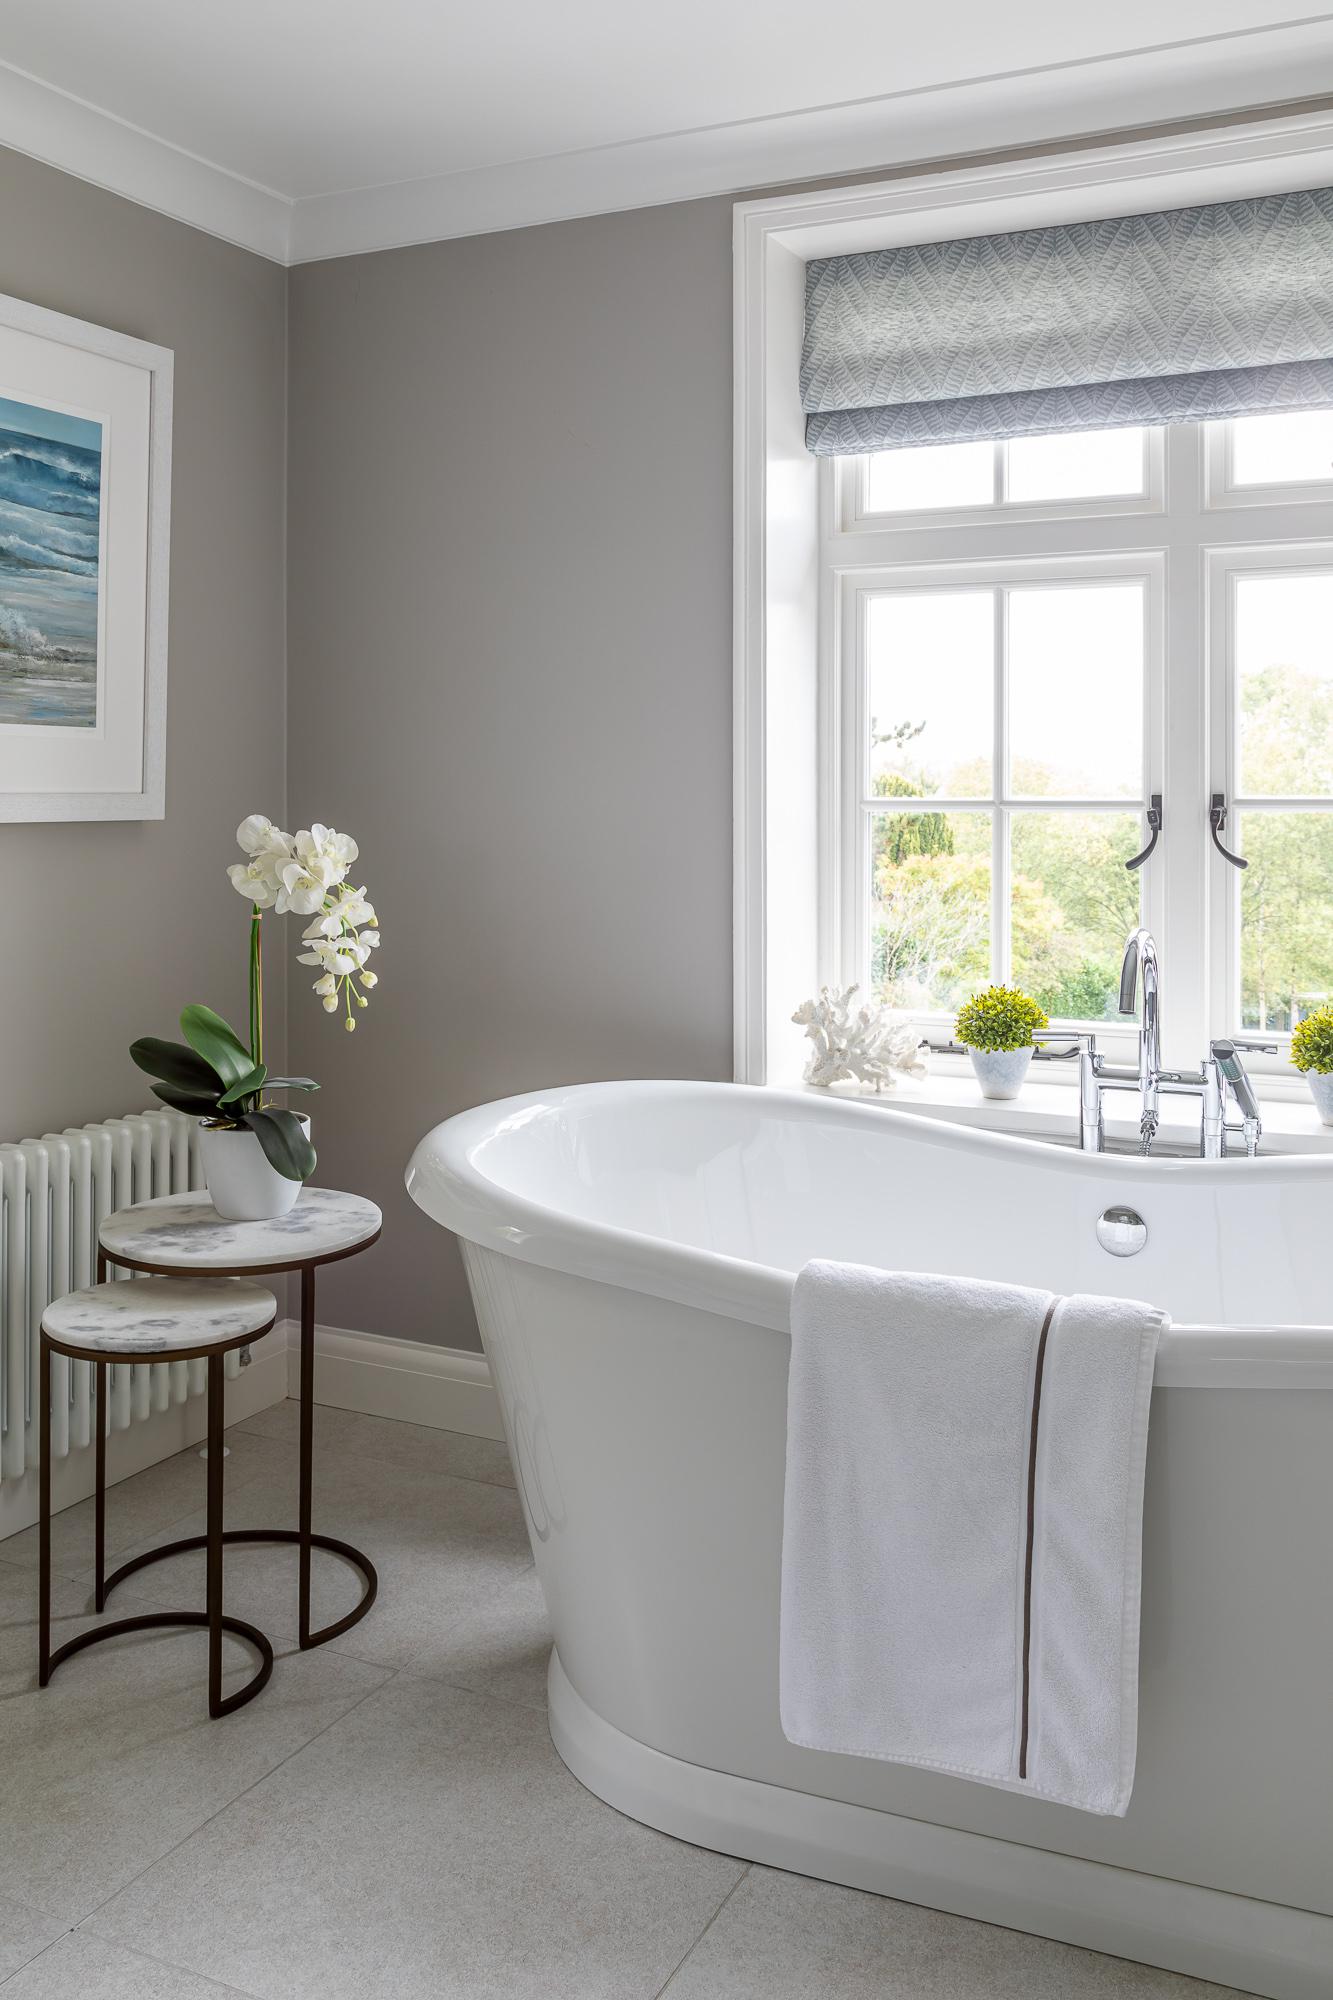 jonathan bond, interior photographer, freestanding bath, great missenden, buckinghamshire